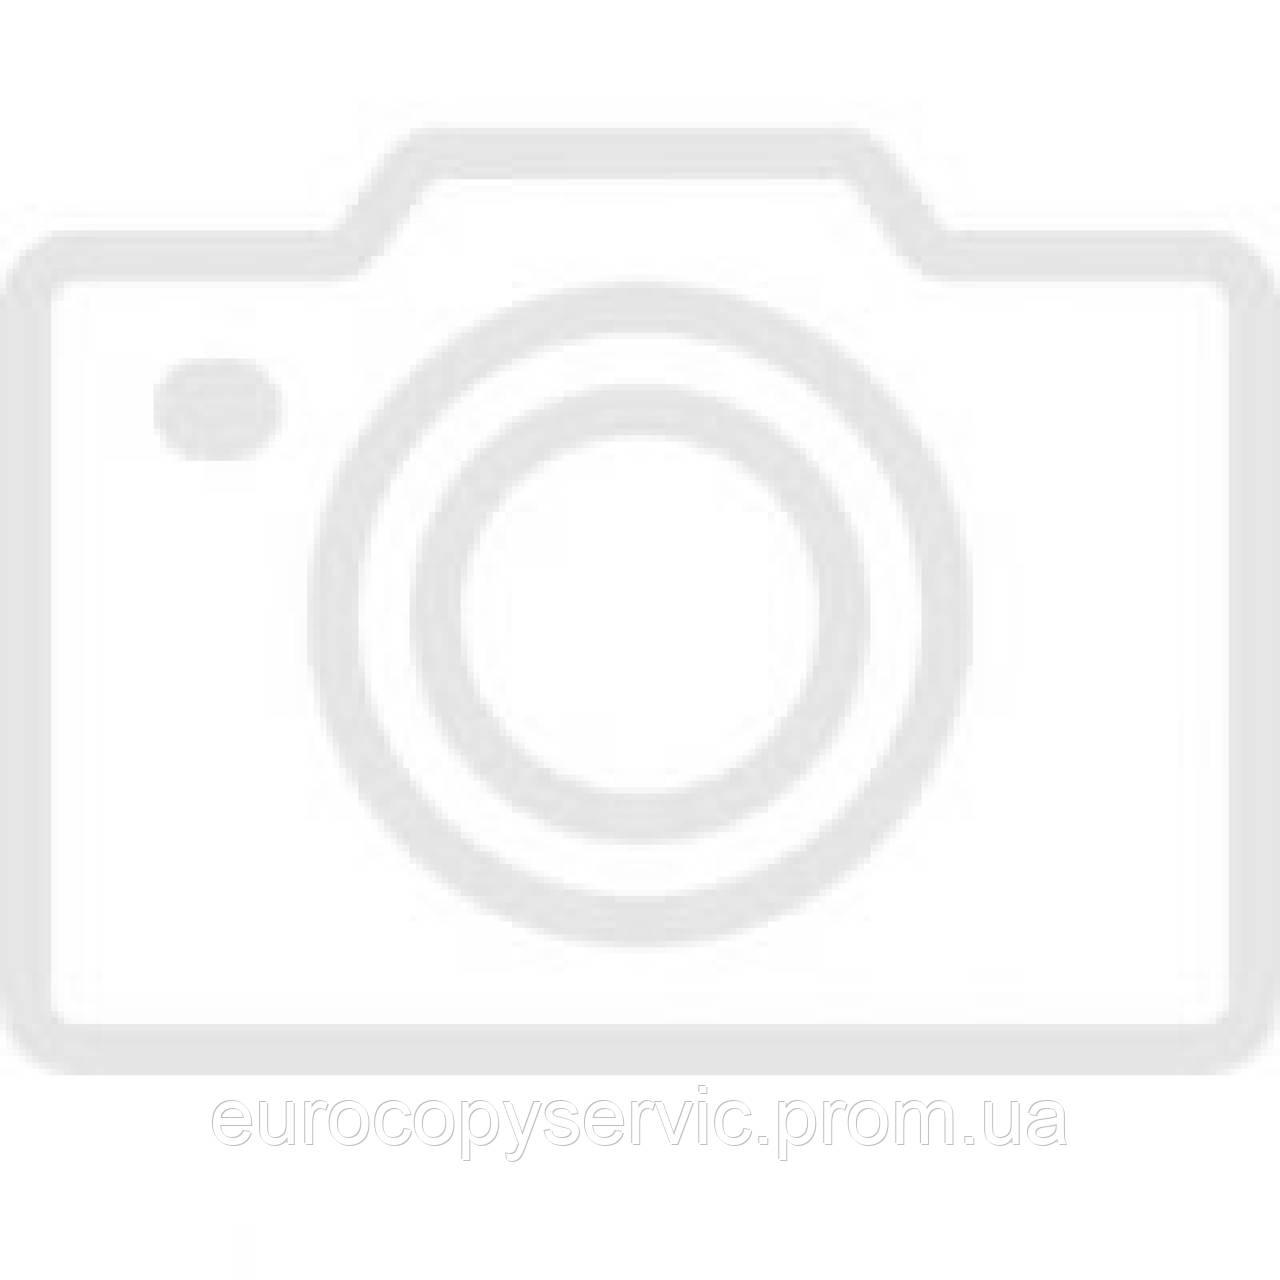 Держатель ролика захвата лотка 2 HP LJ 4200/ 4300 (RC1-0211-000CN) OEM